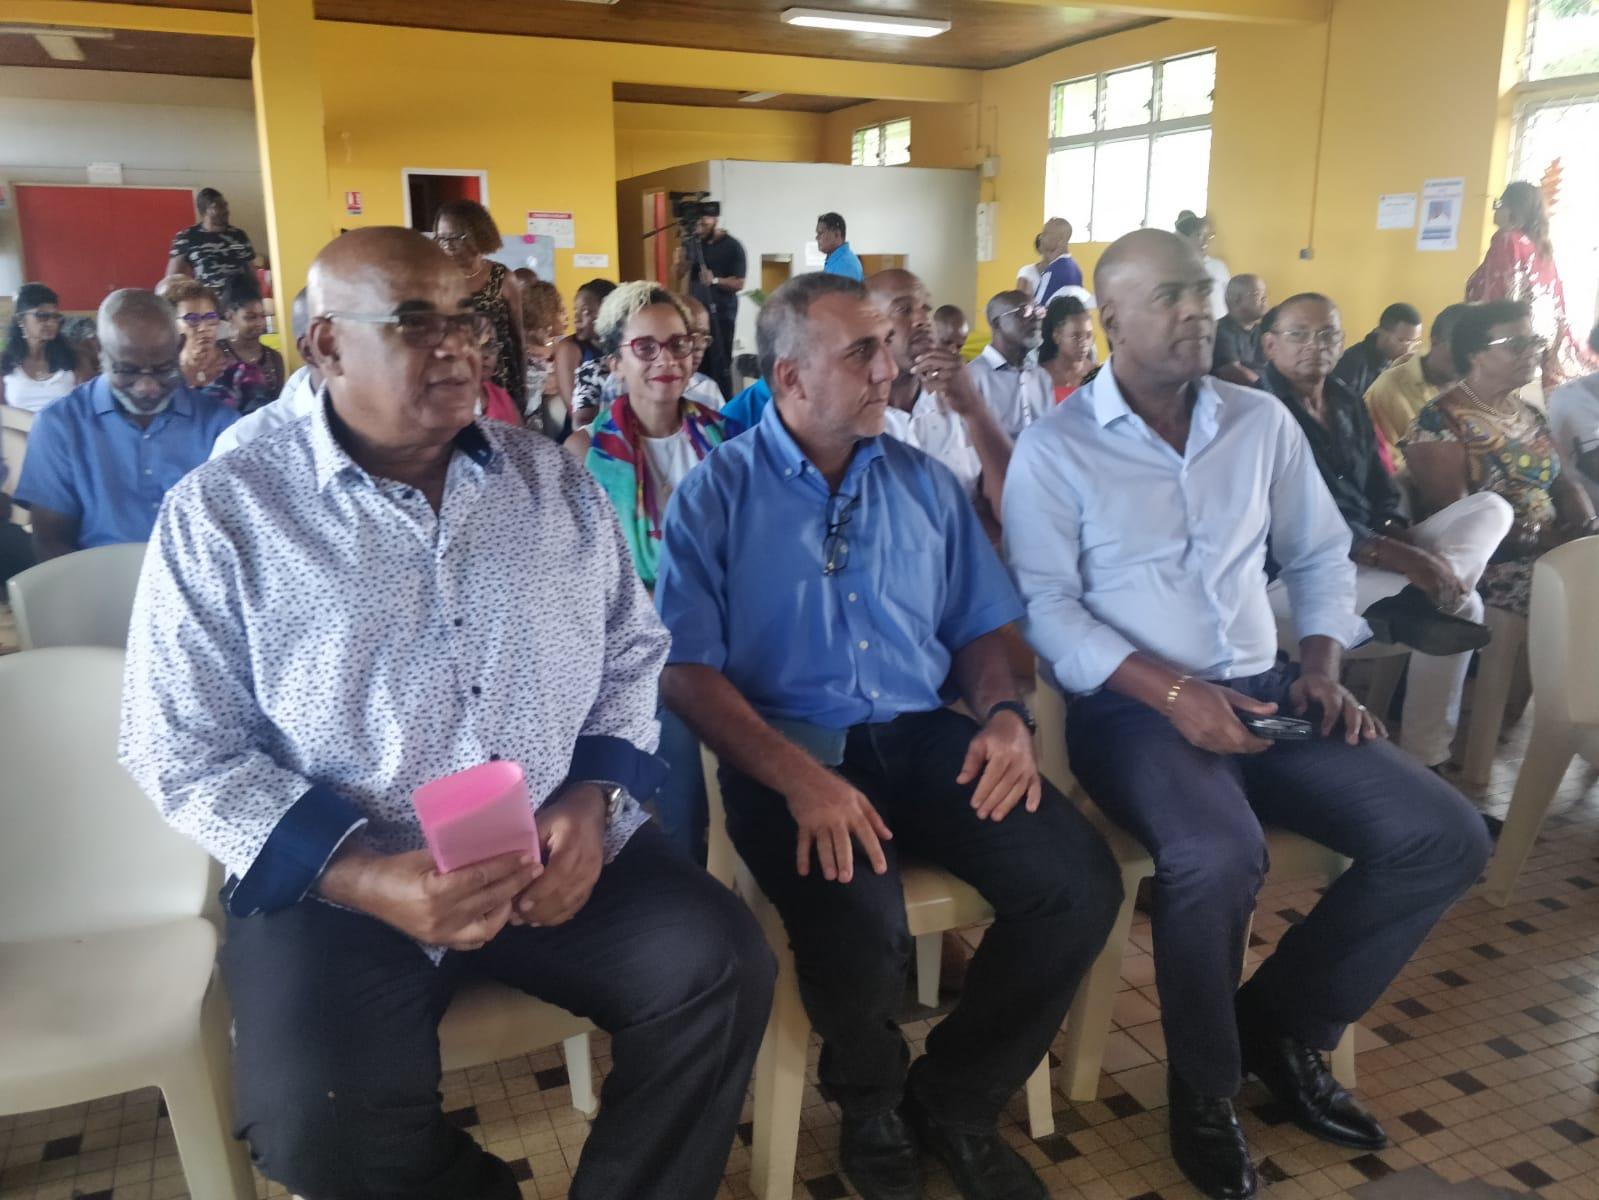 Municipales 2020 : Emmanuel Granier a tenu son premier meeting de campagne en 2020